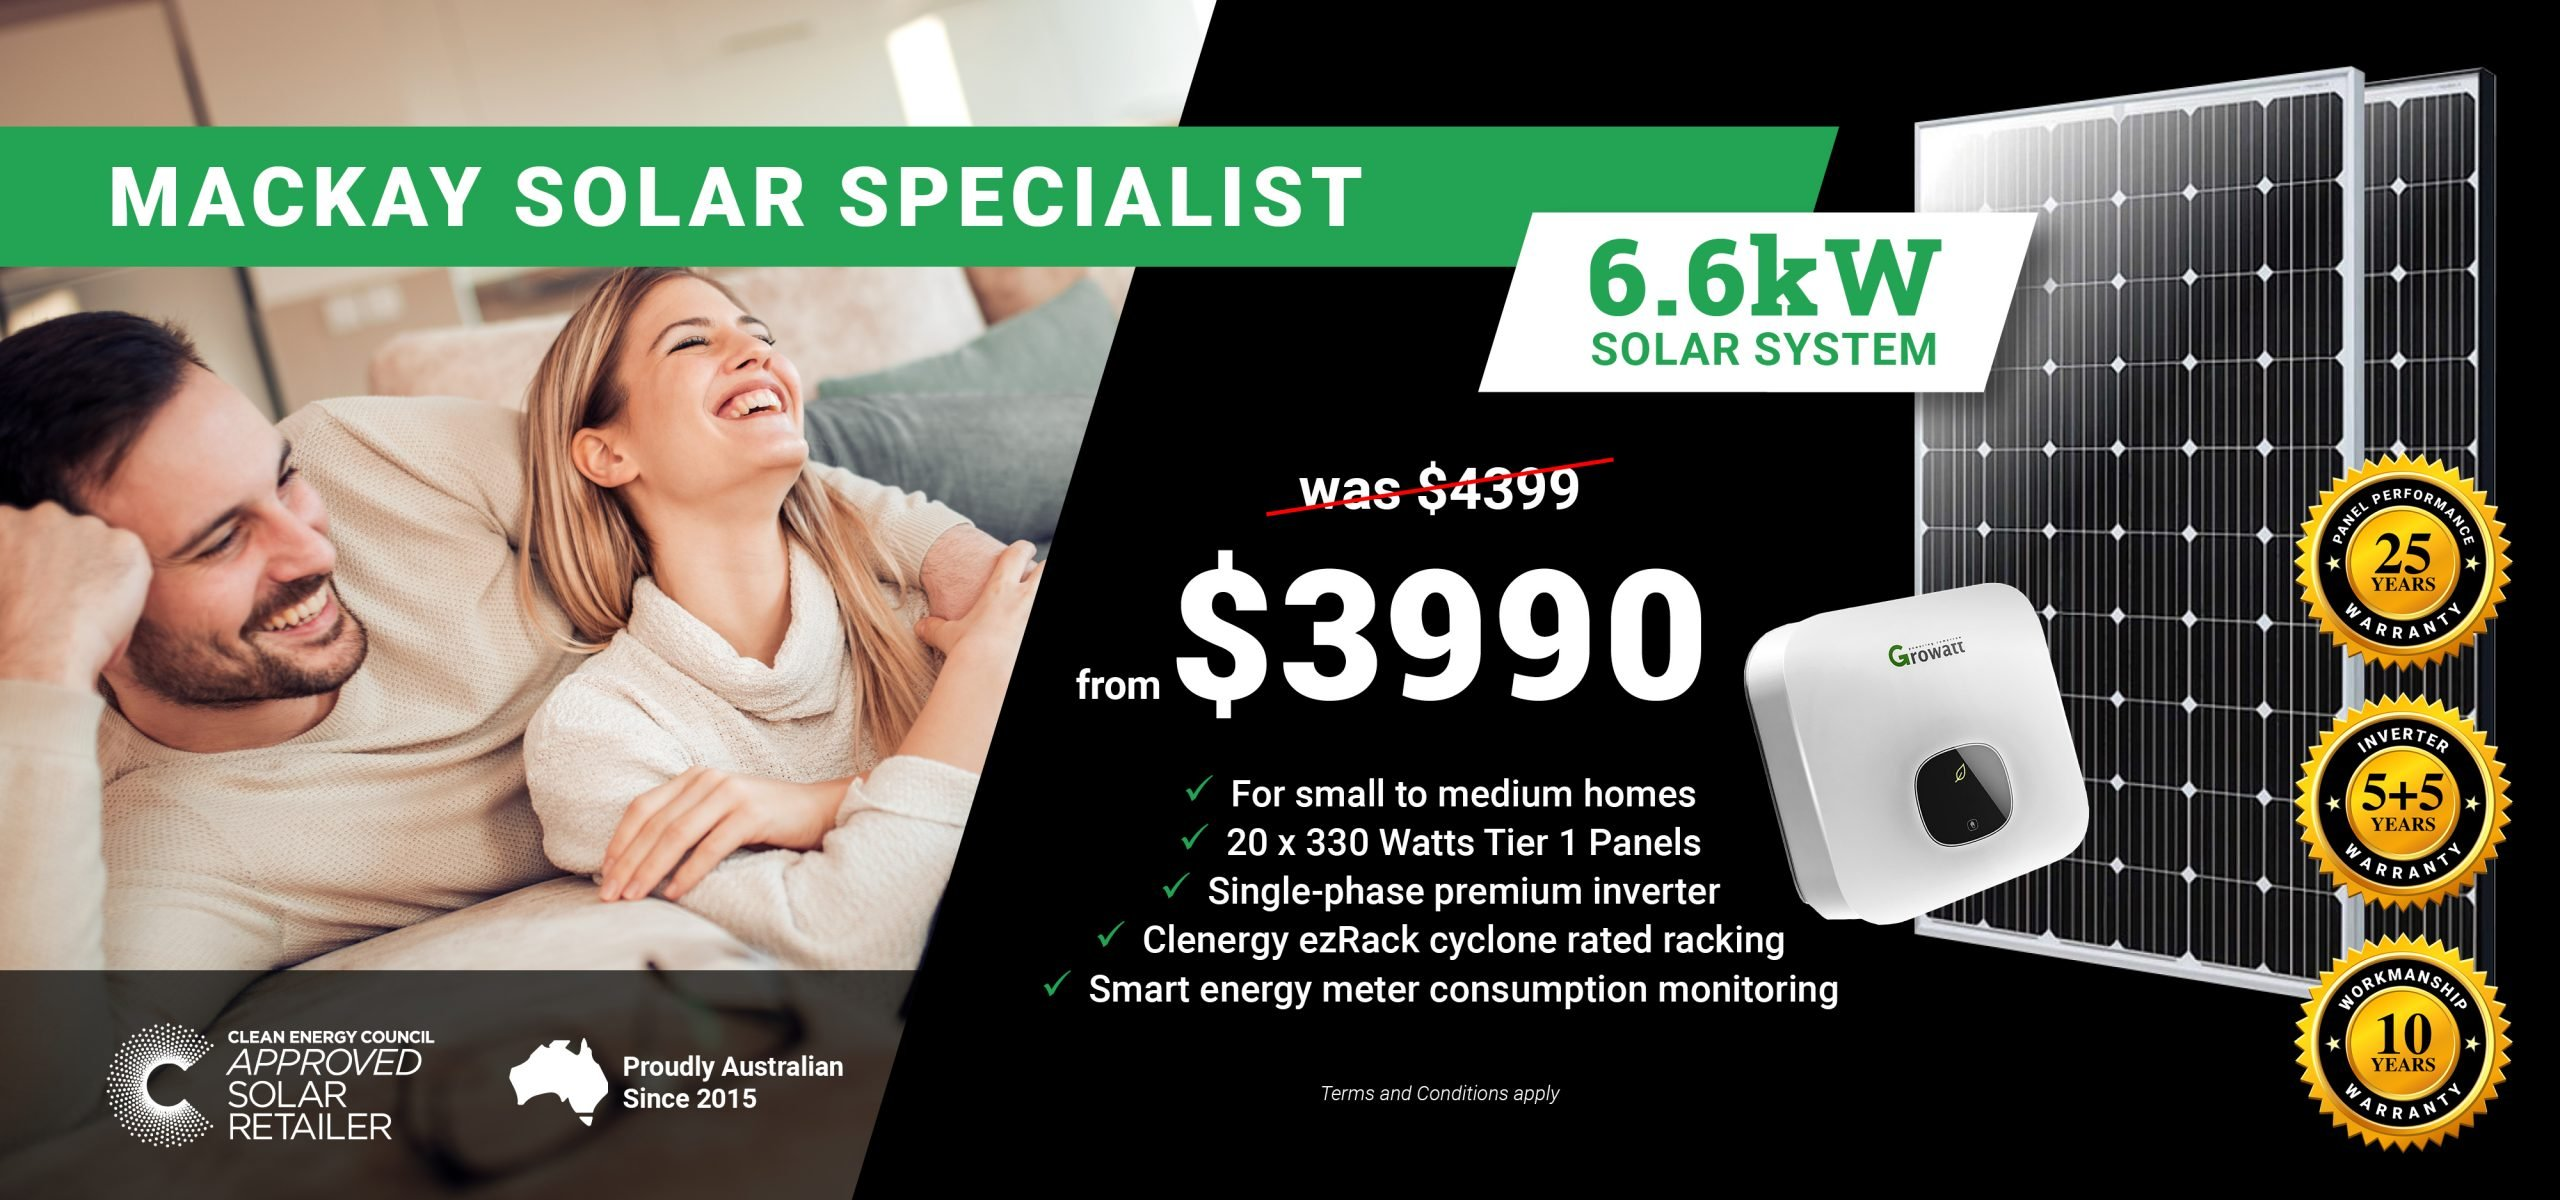 Mackay 6.6kw Solar Special DT